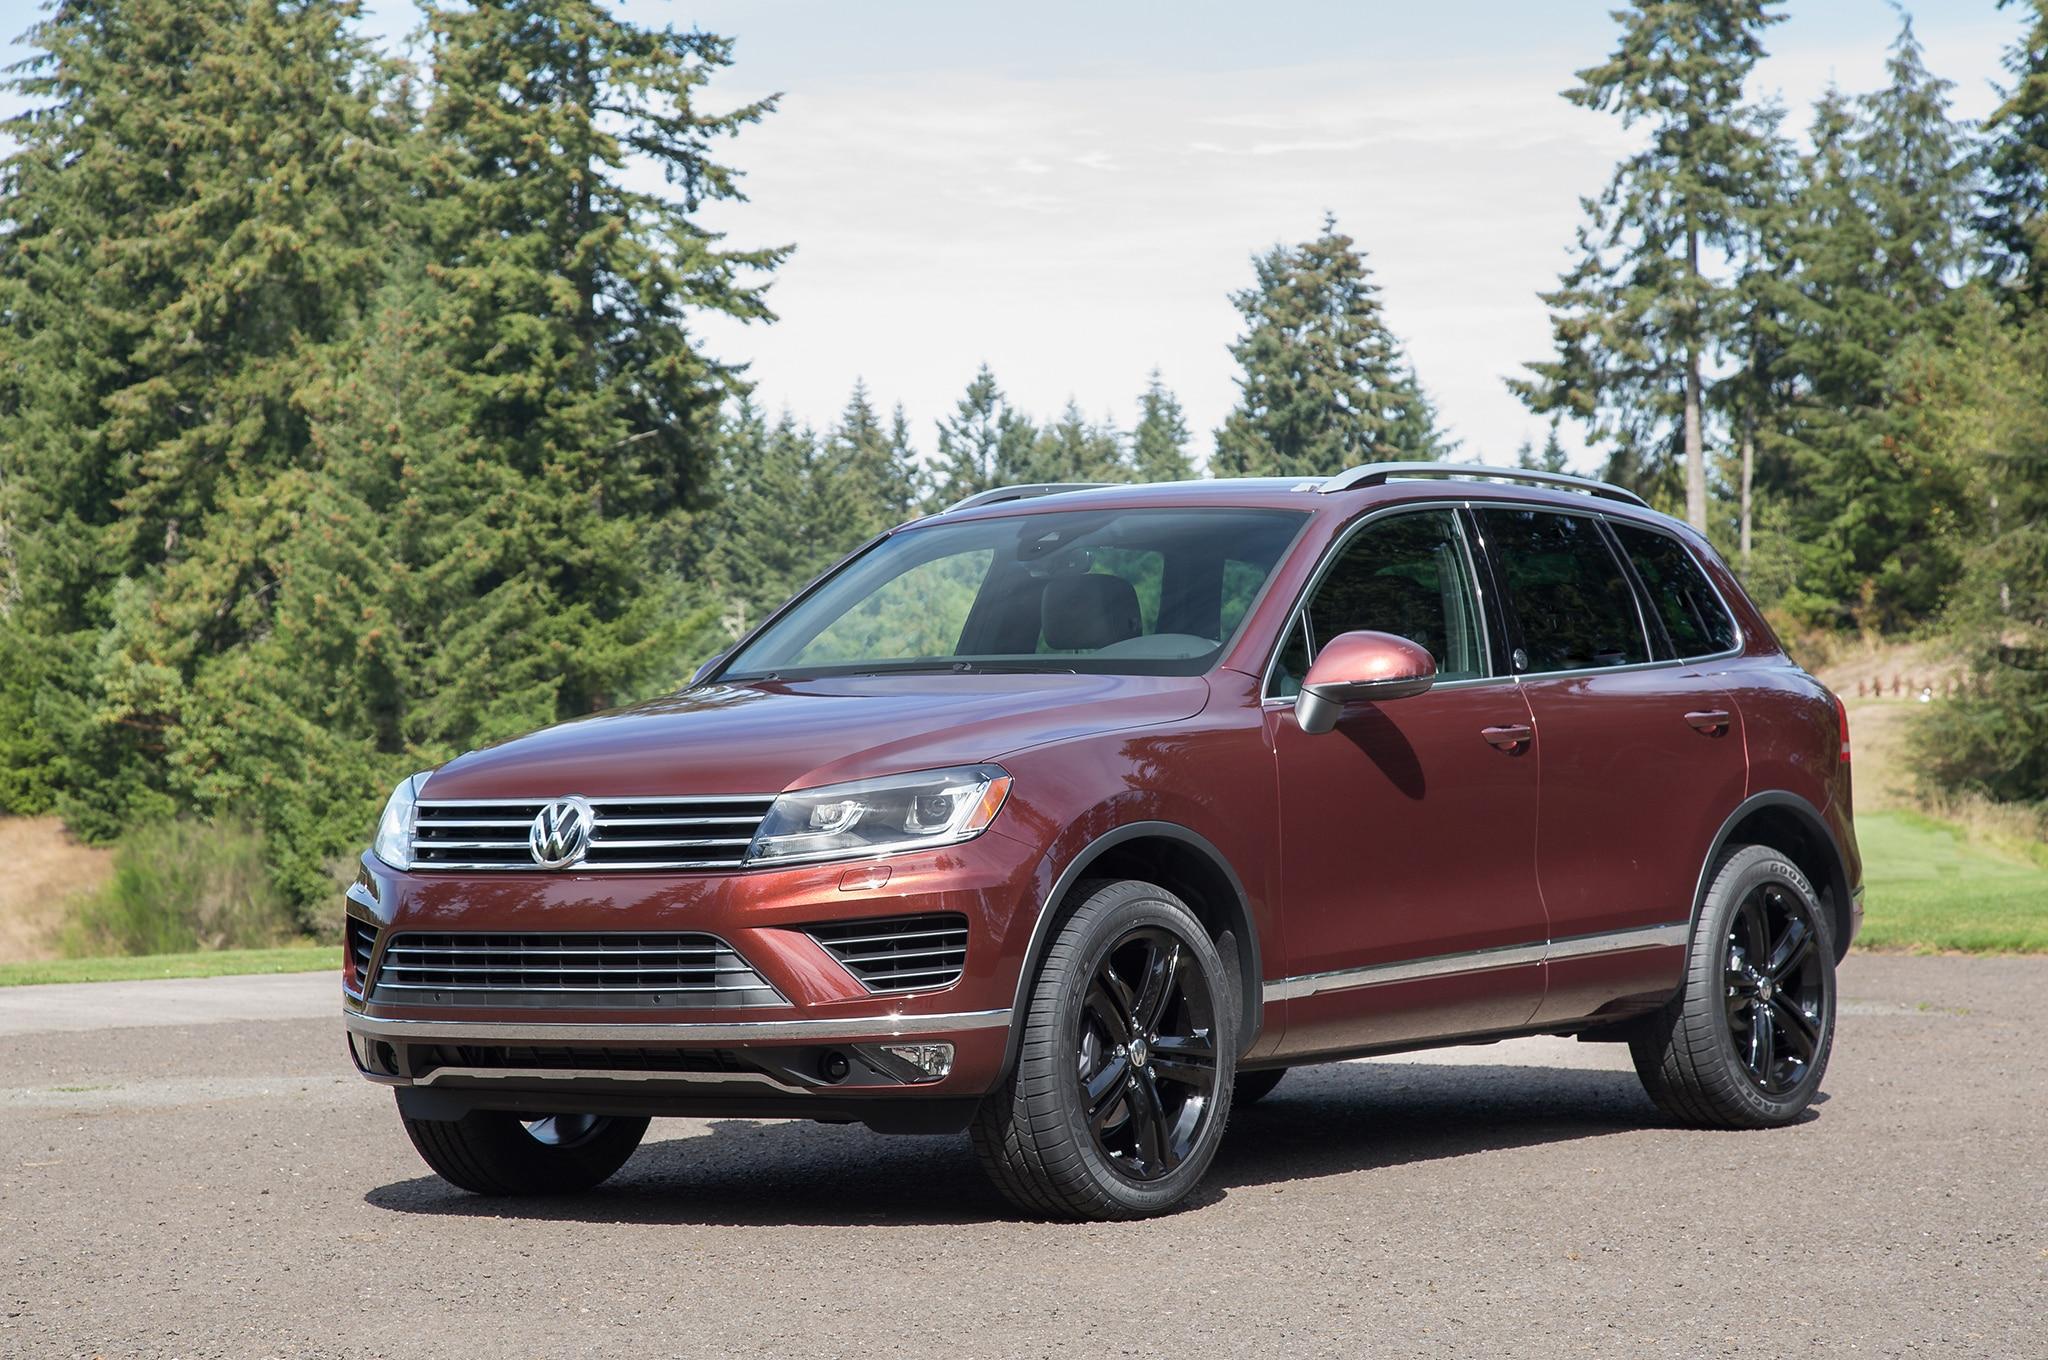 2017 Volkswagen Touareg Front Three Quarter